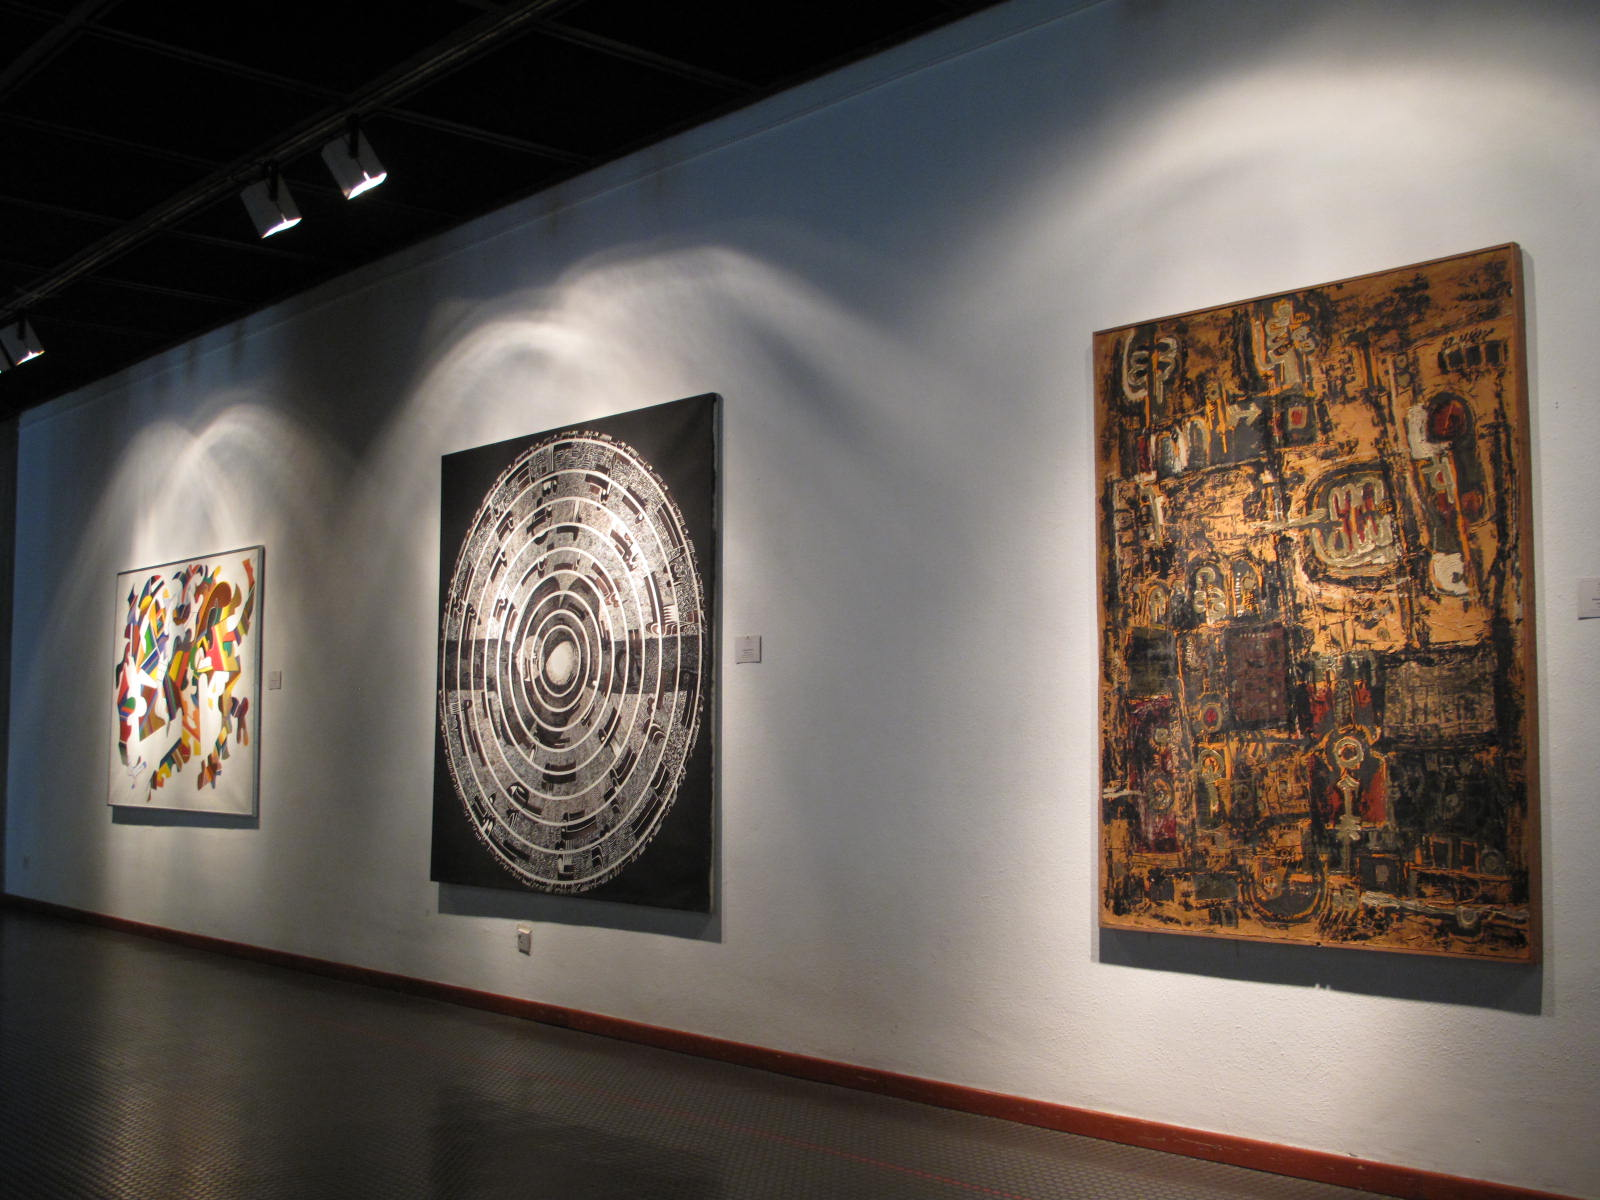 tehran-musuem-contemporary-art-tour